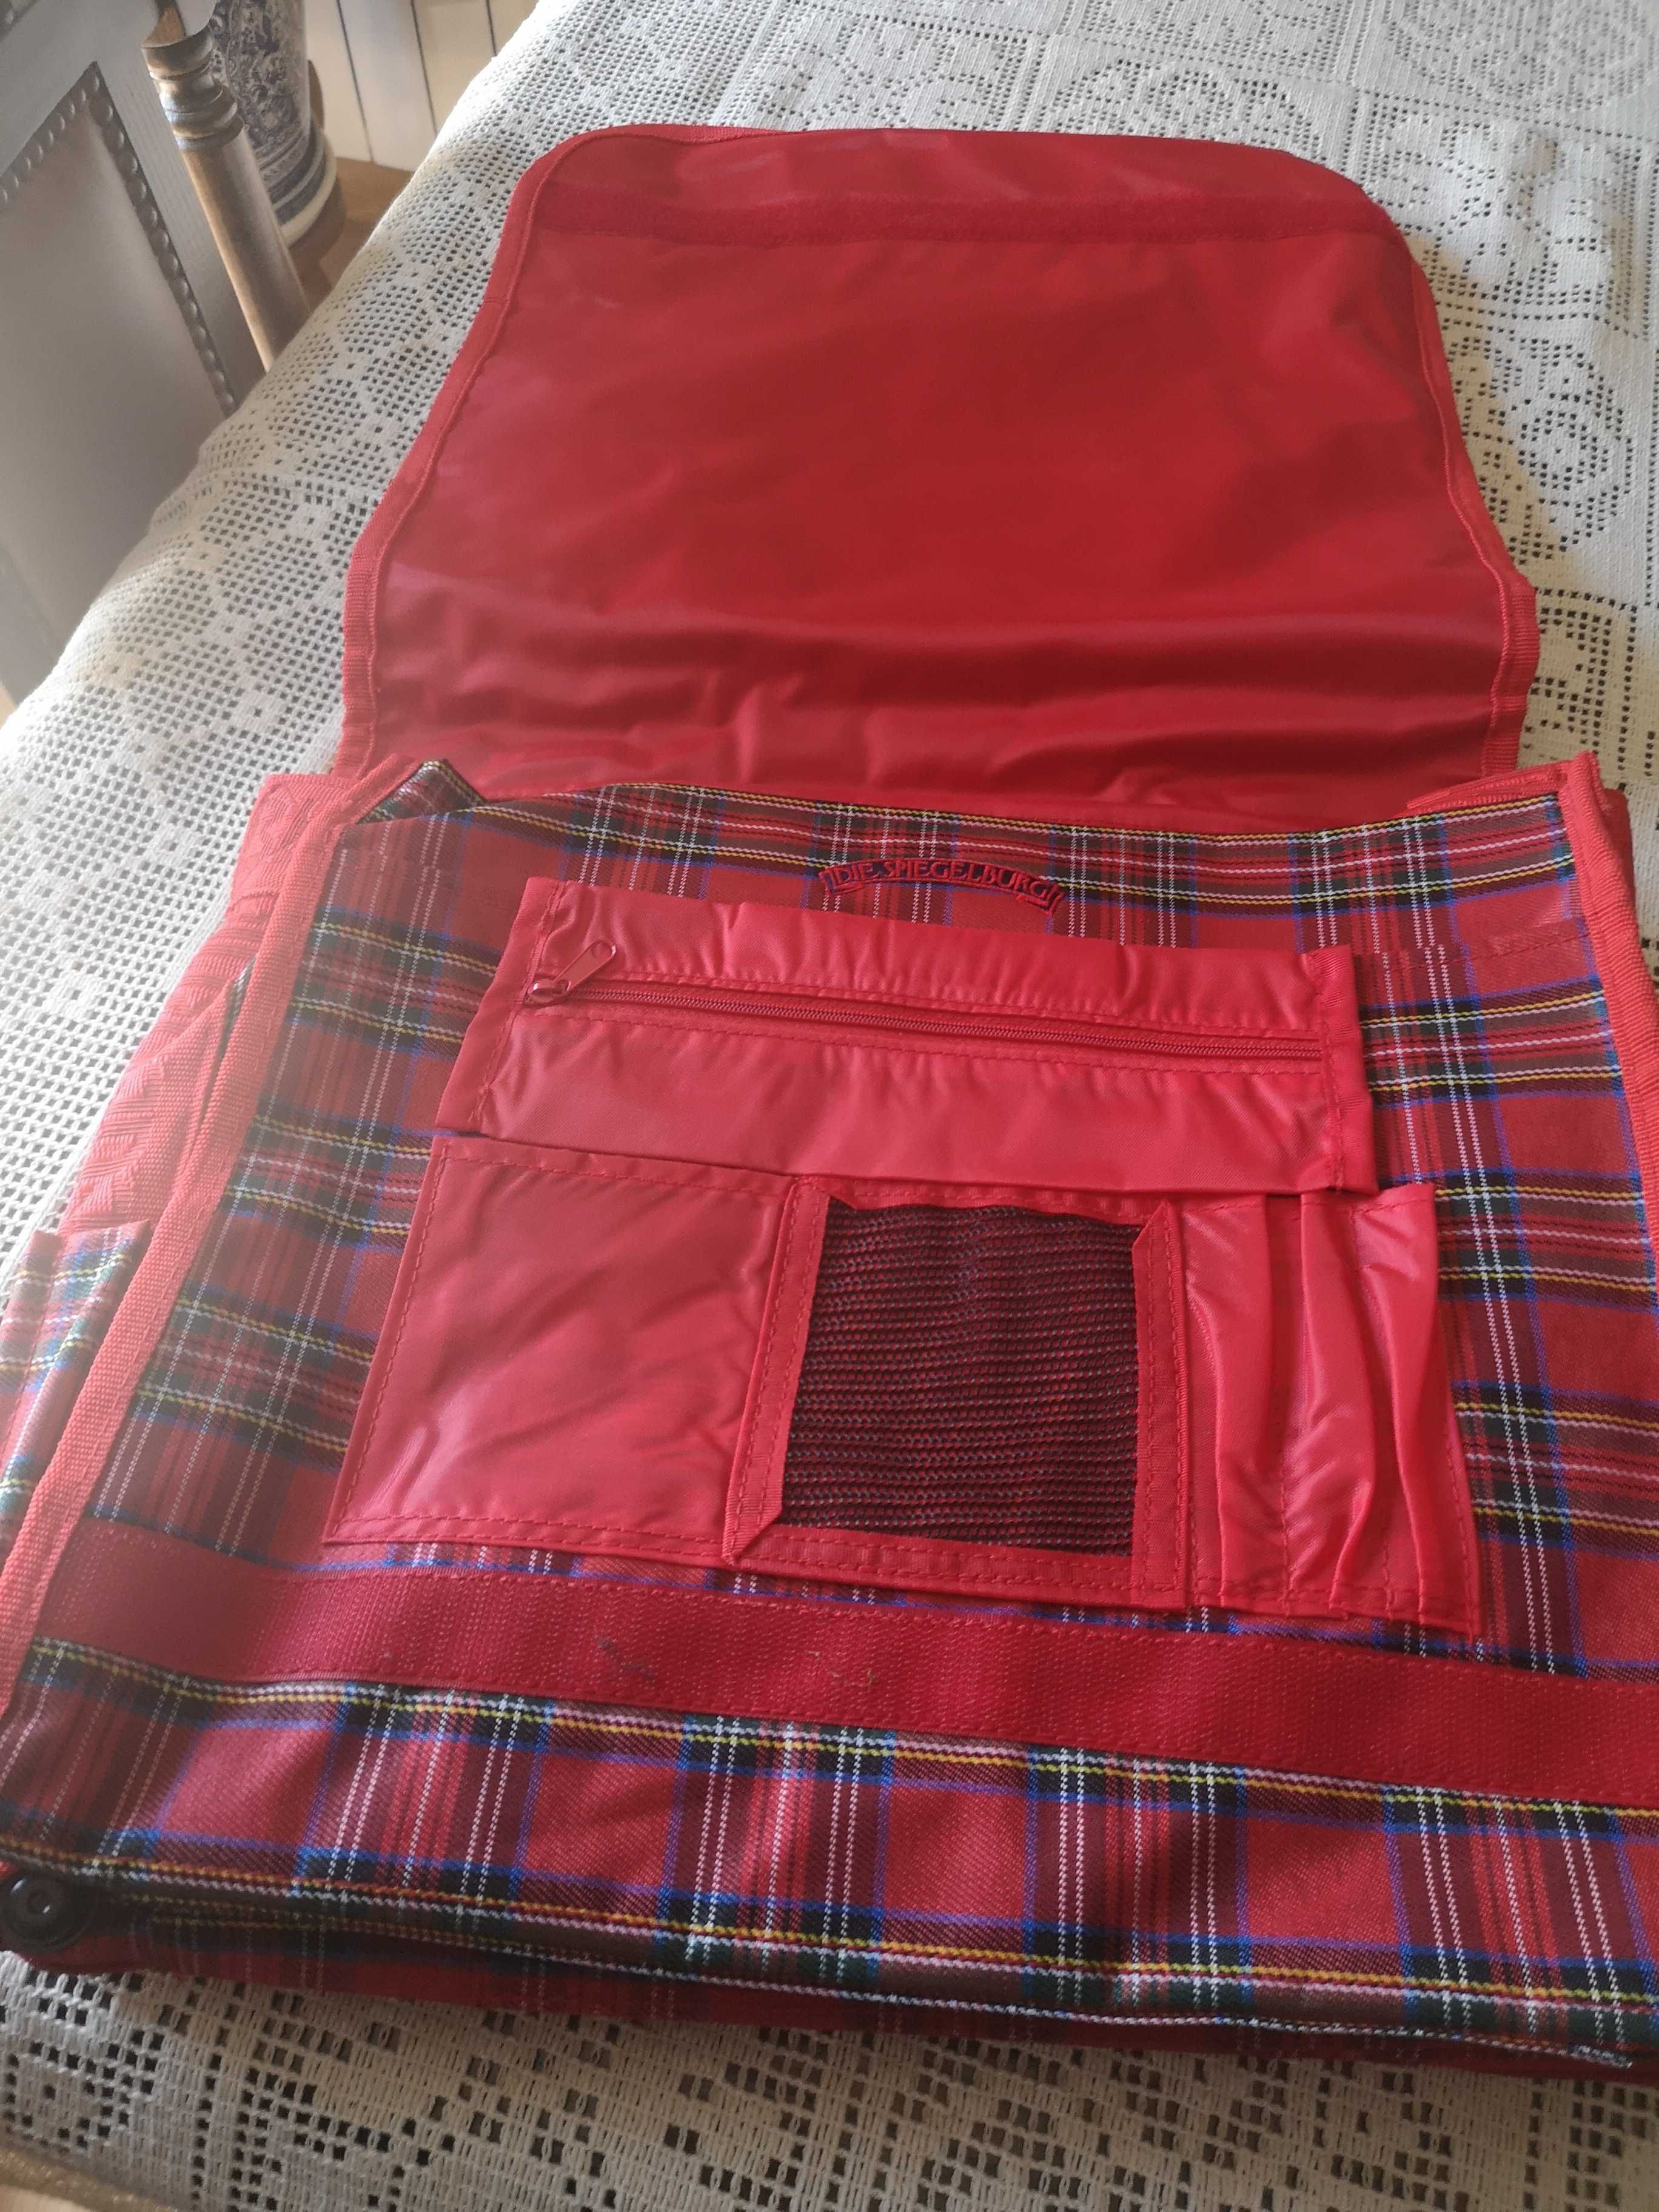 mochila escolar nova